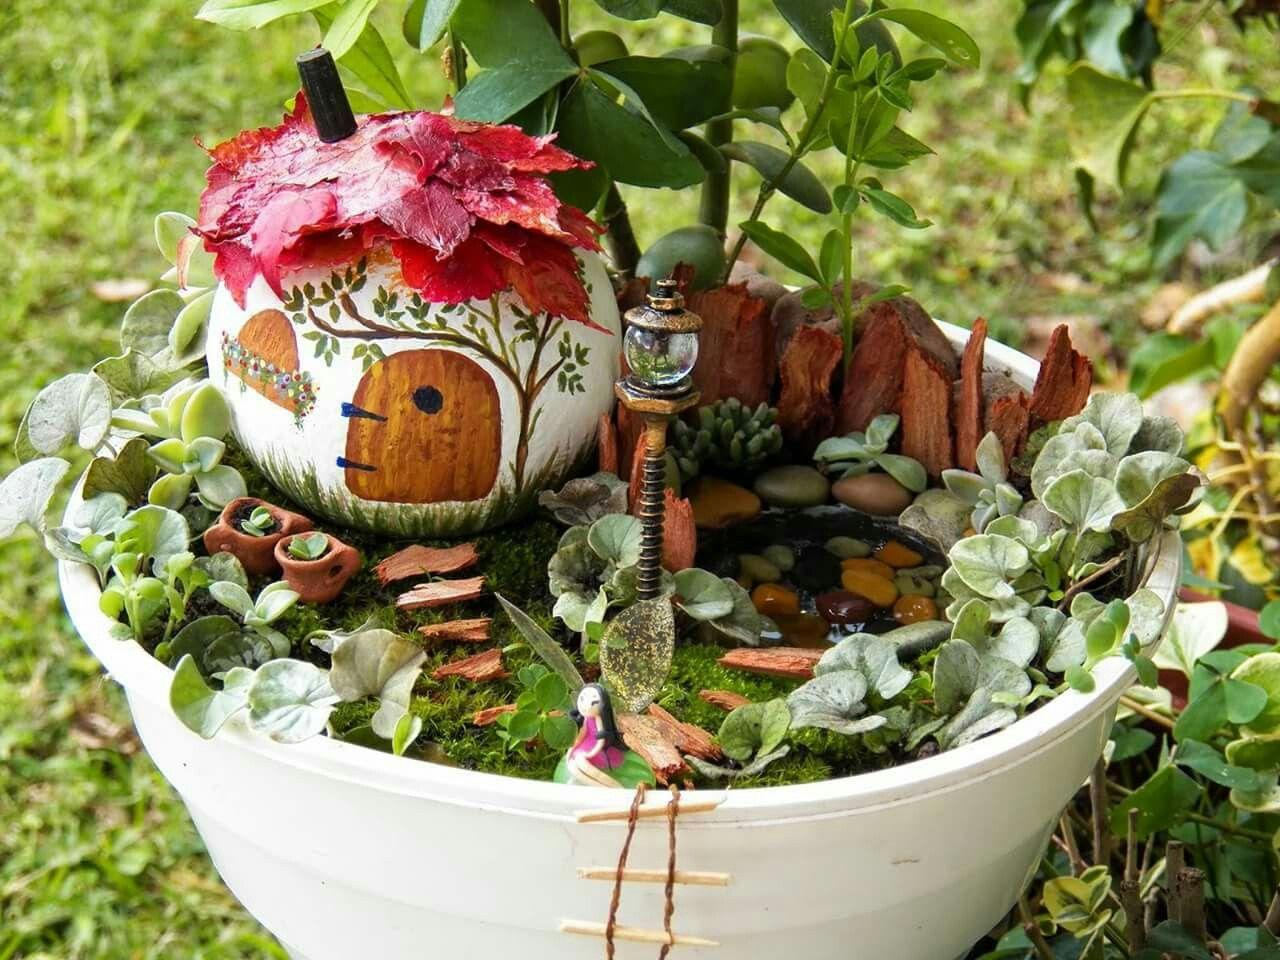 Jardines miniaturas flores naturales pinterest for Adornos para jardin caseros